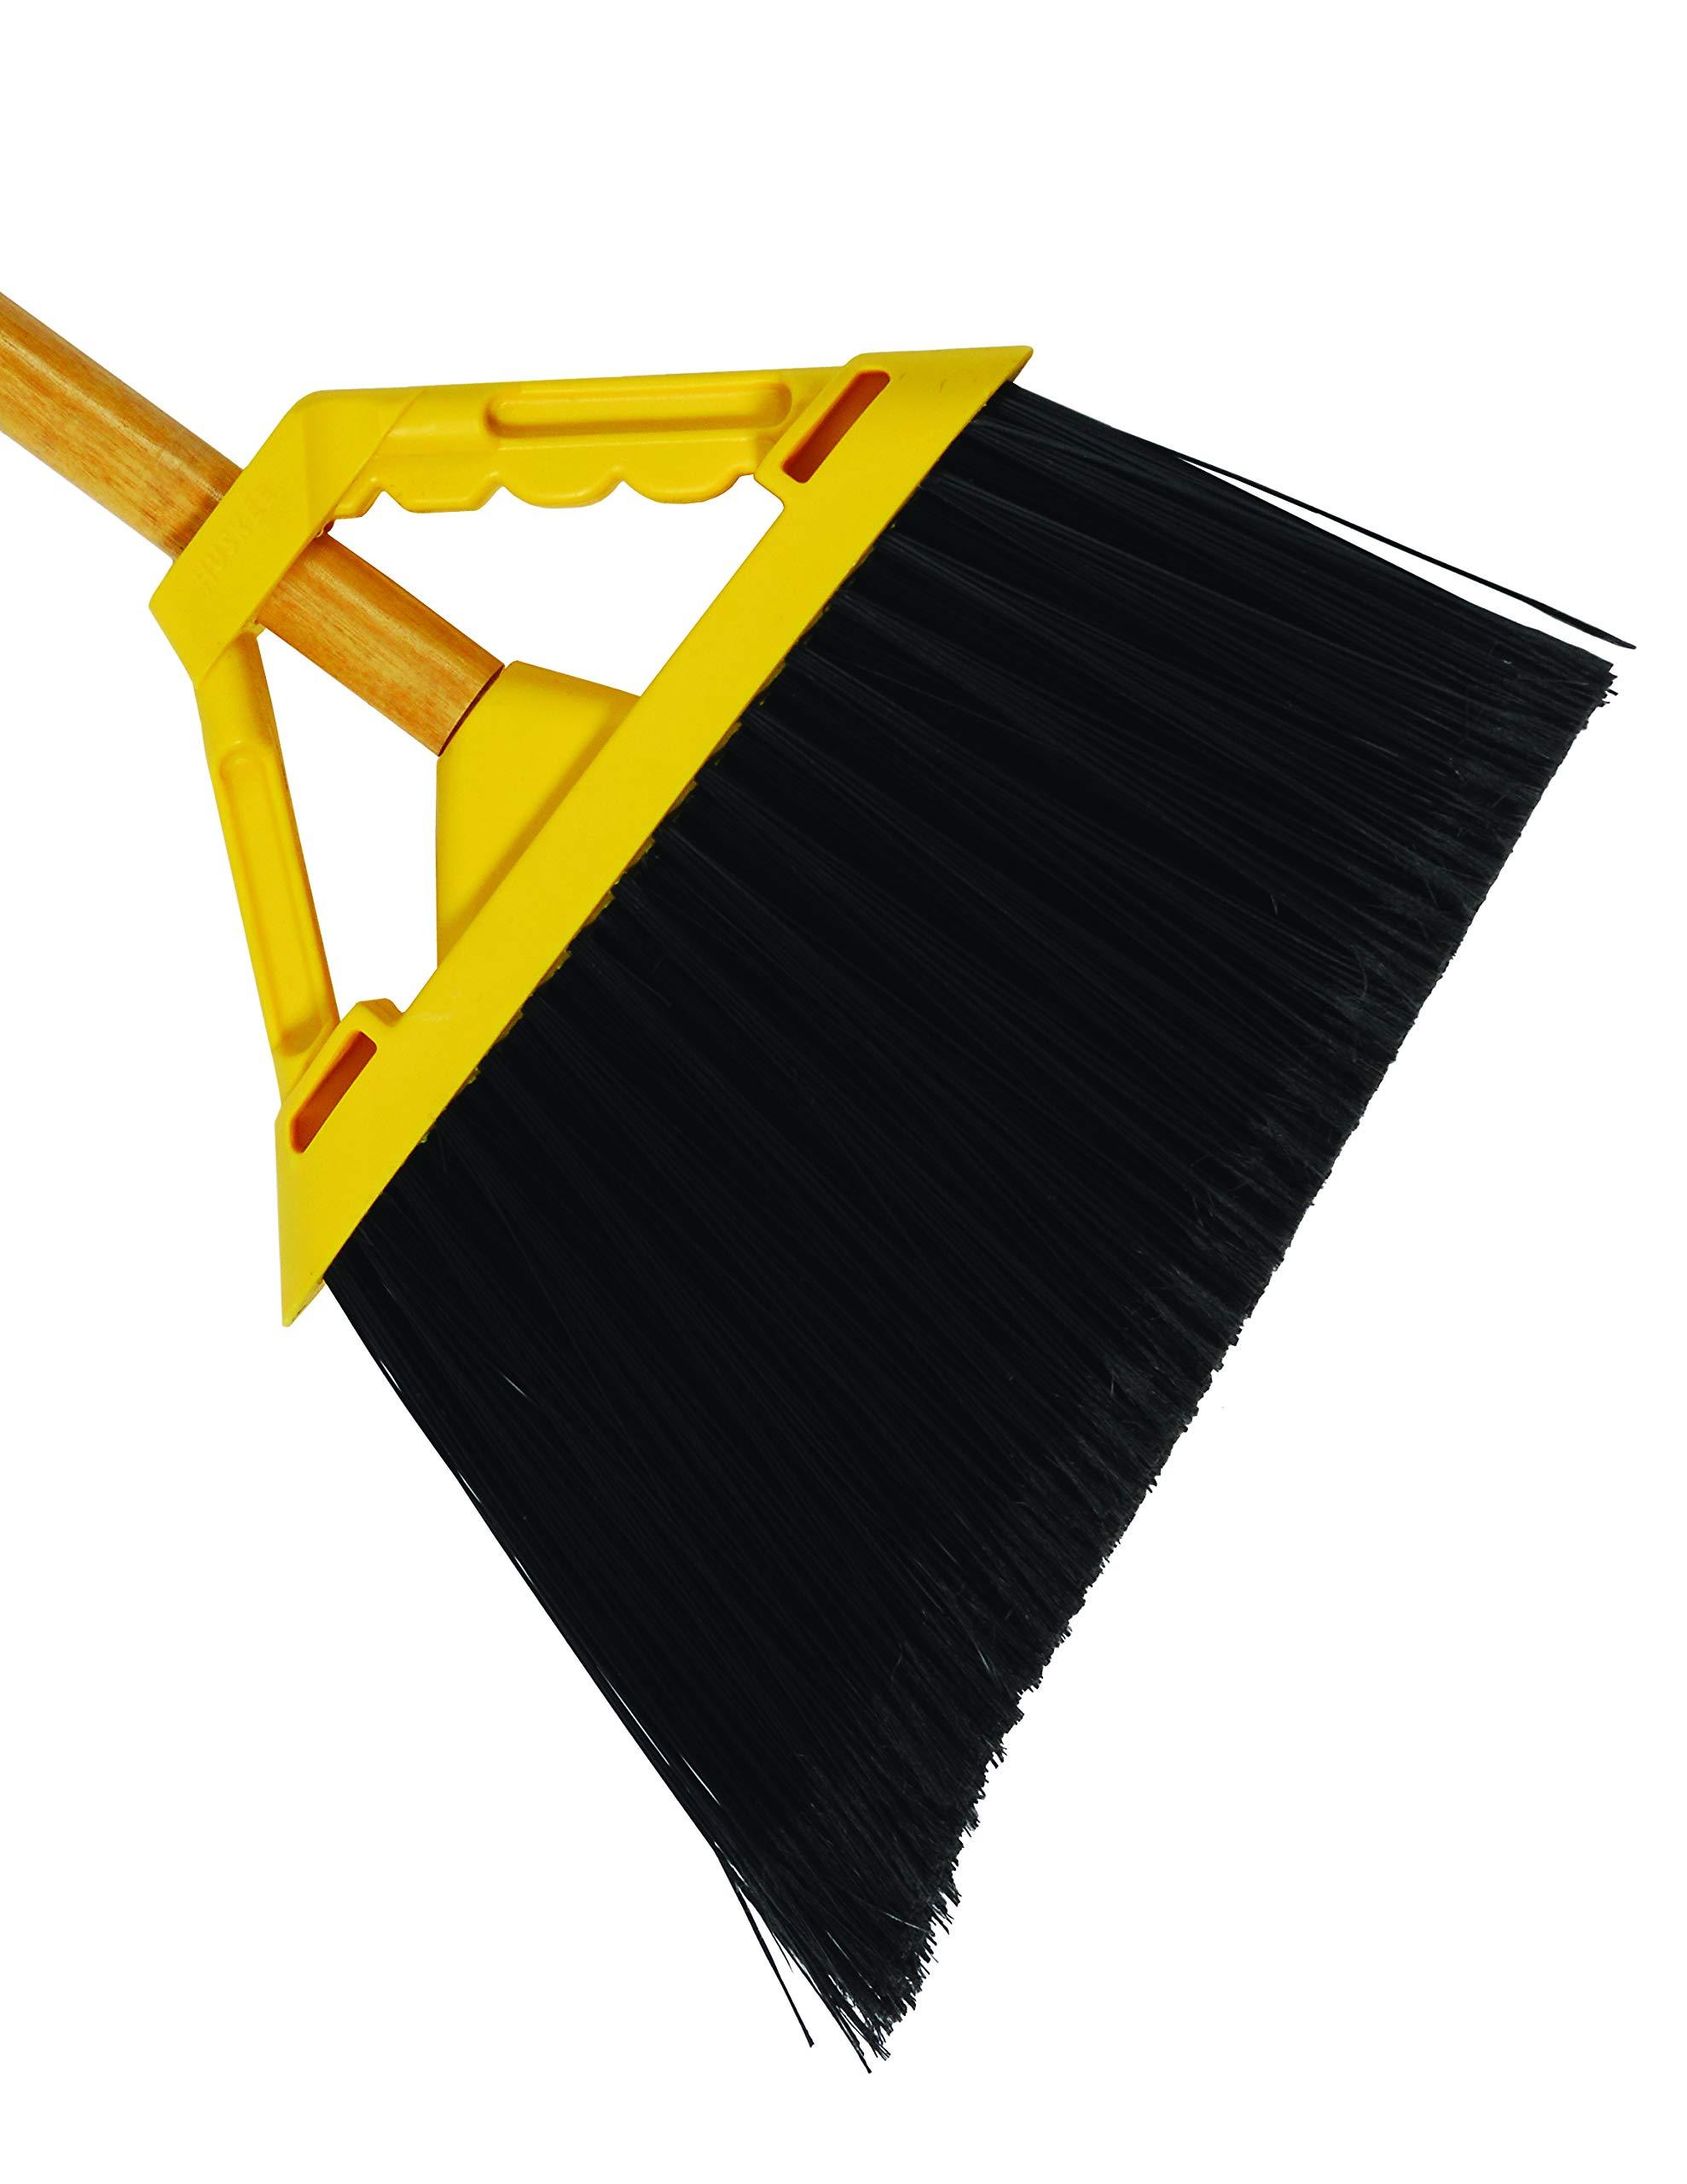 Disco Huskee Heavy Duty Sweep Angle Broom, 6 inch Bristle Length -- 6 per case.